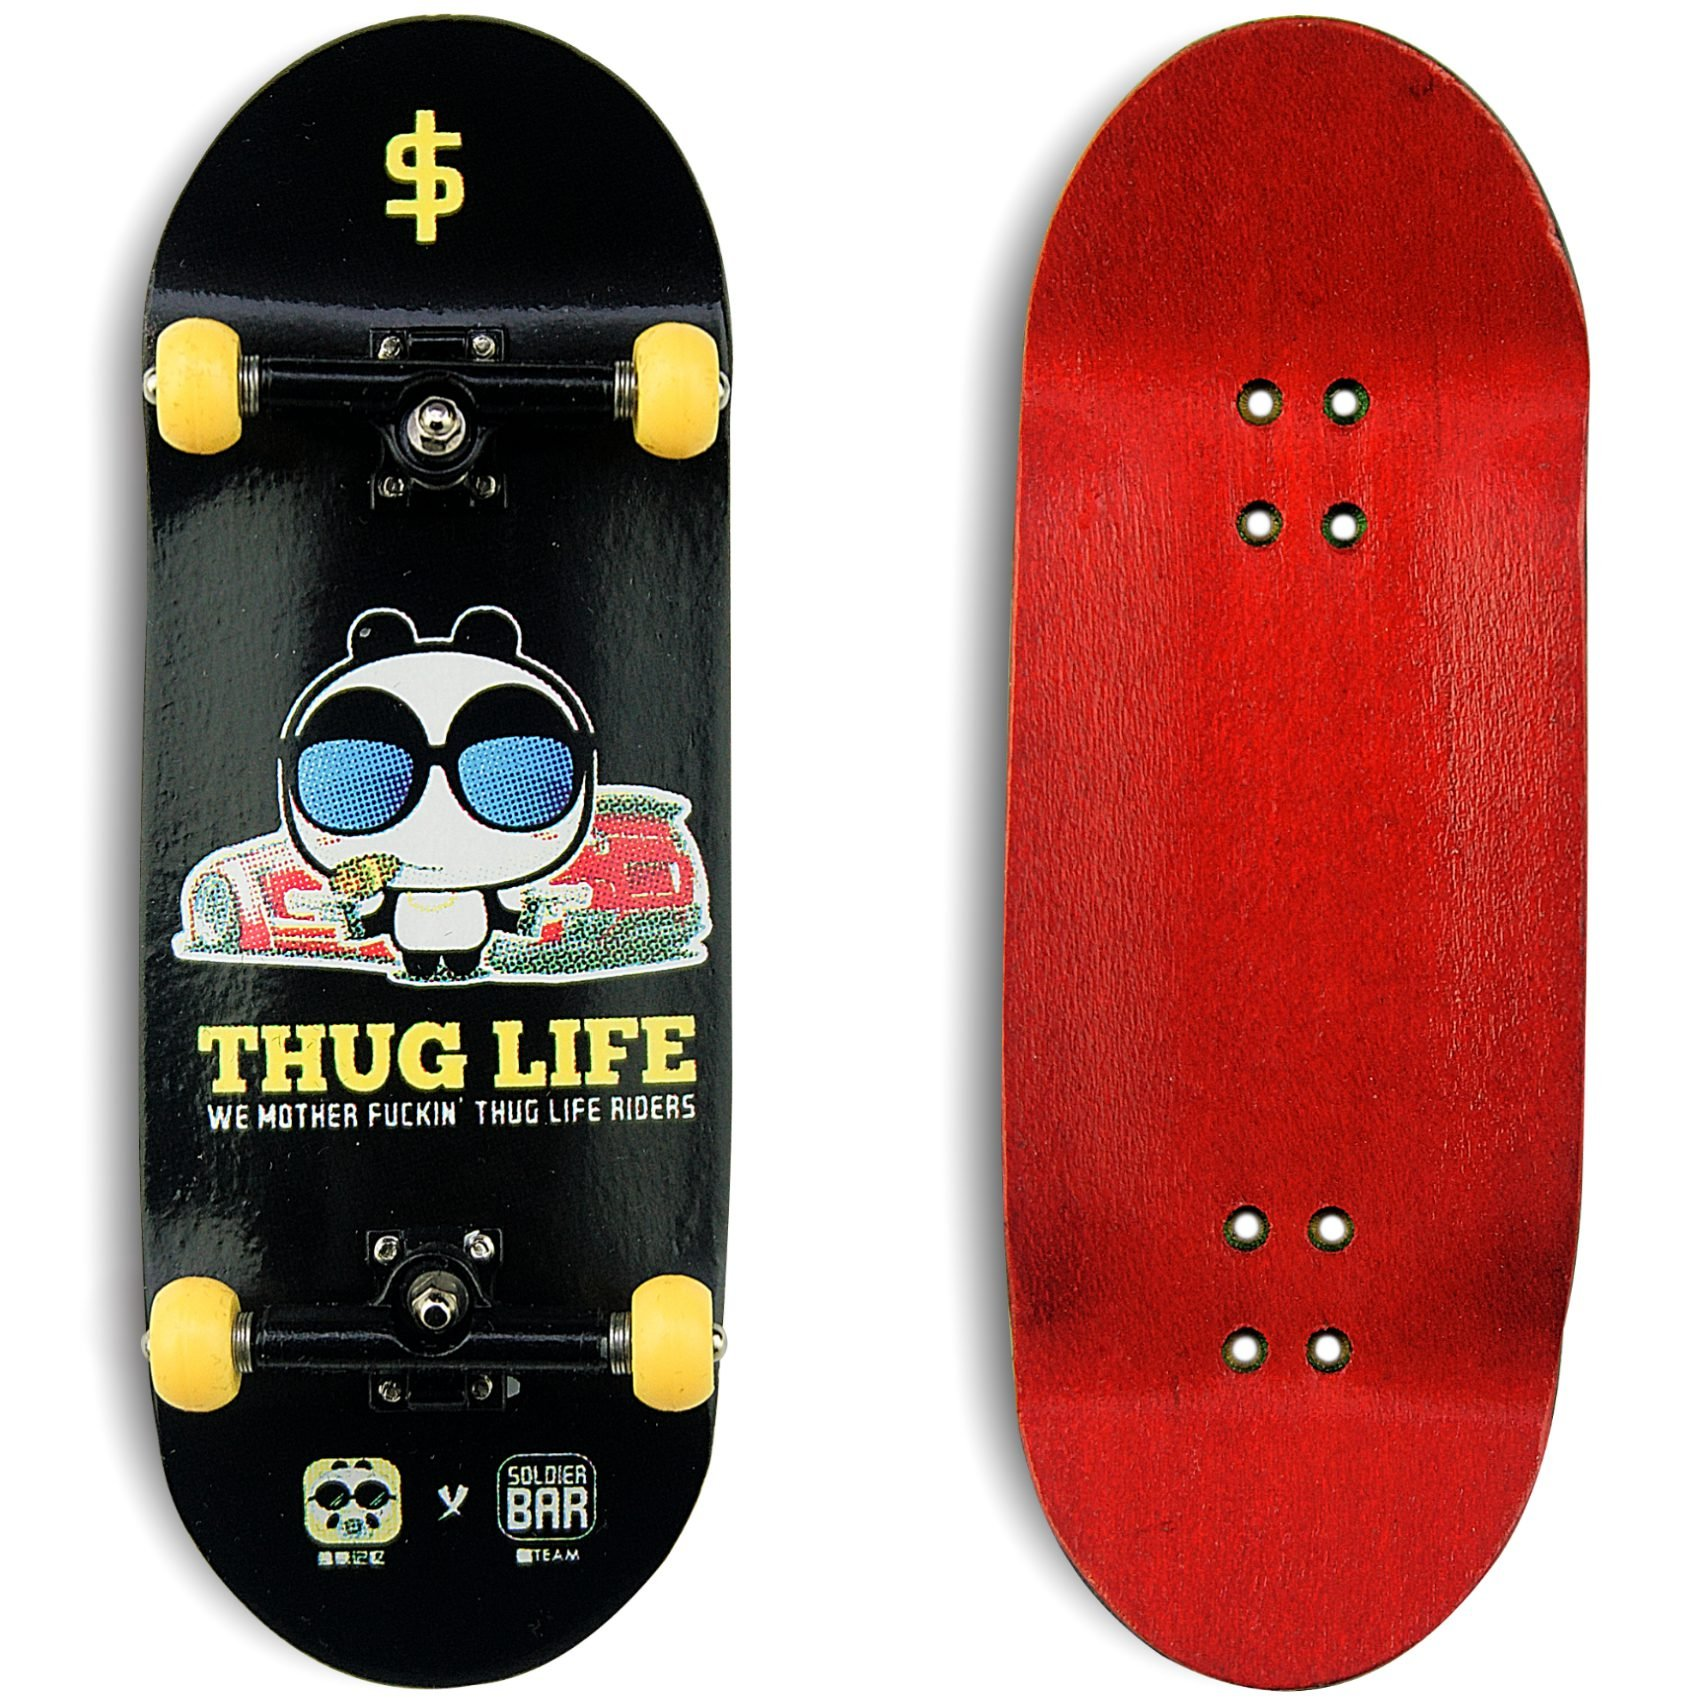 SOLDIERBAR FAN Team 9.0 Wooden Fingerboards (Deck,Truck,Wheel Set) Thug Life